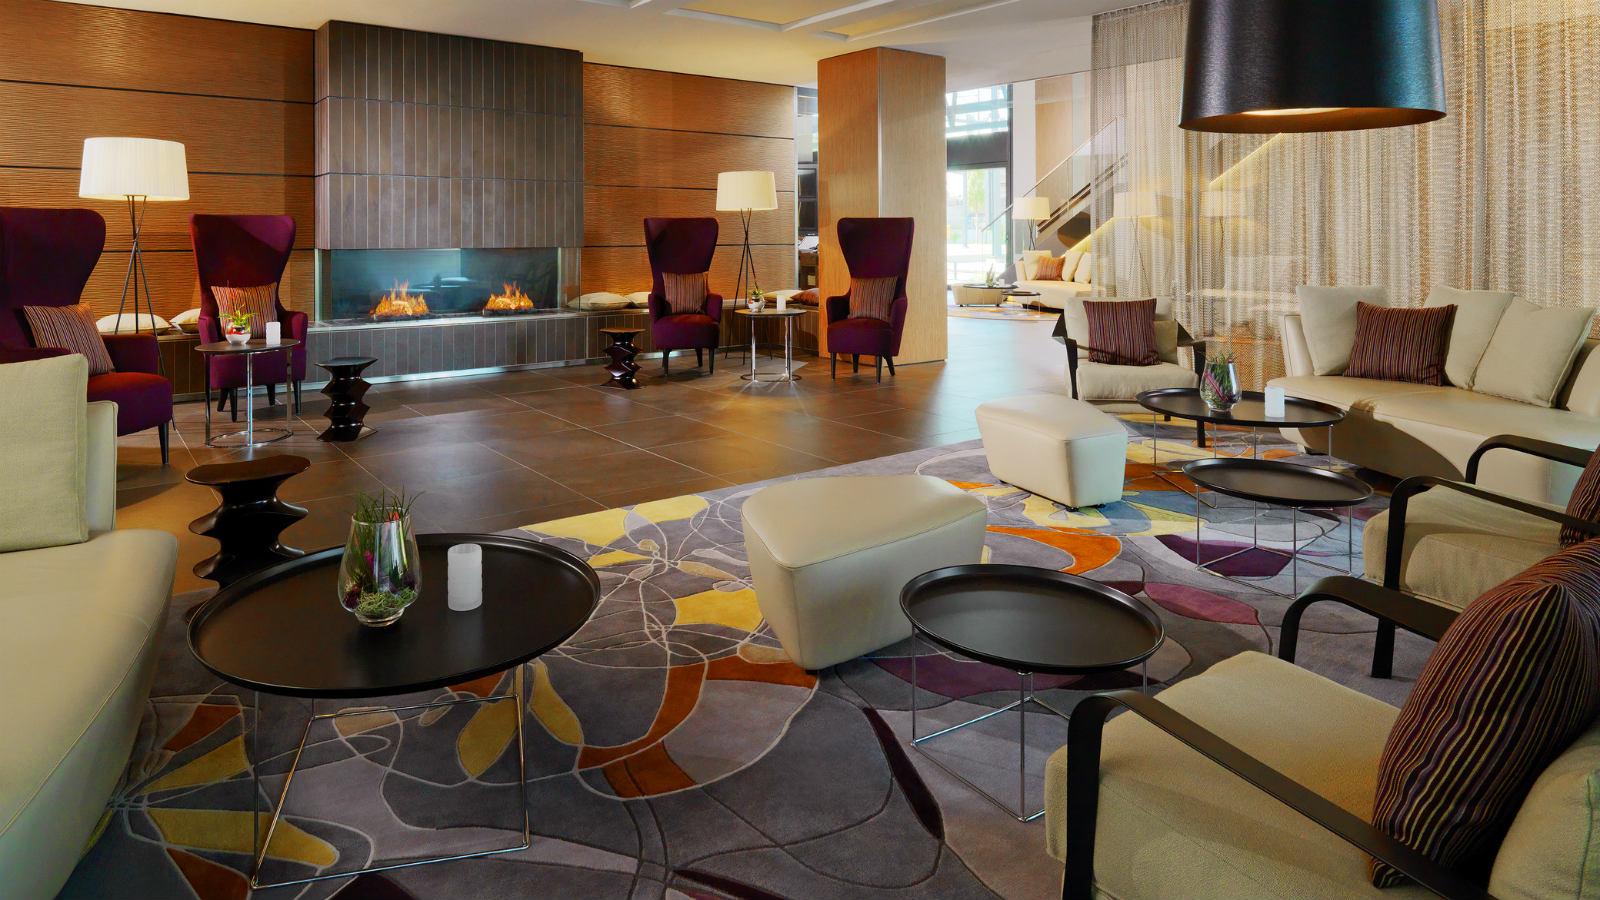 Gallery_3732_Fireplace_Sheraton_Zurich_Hotel